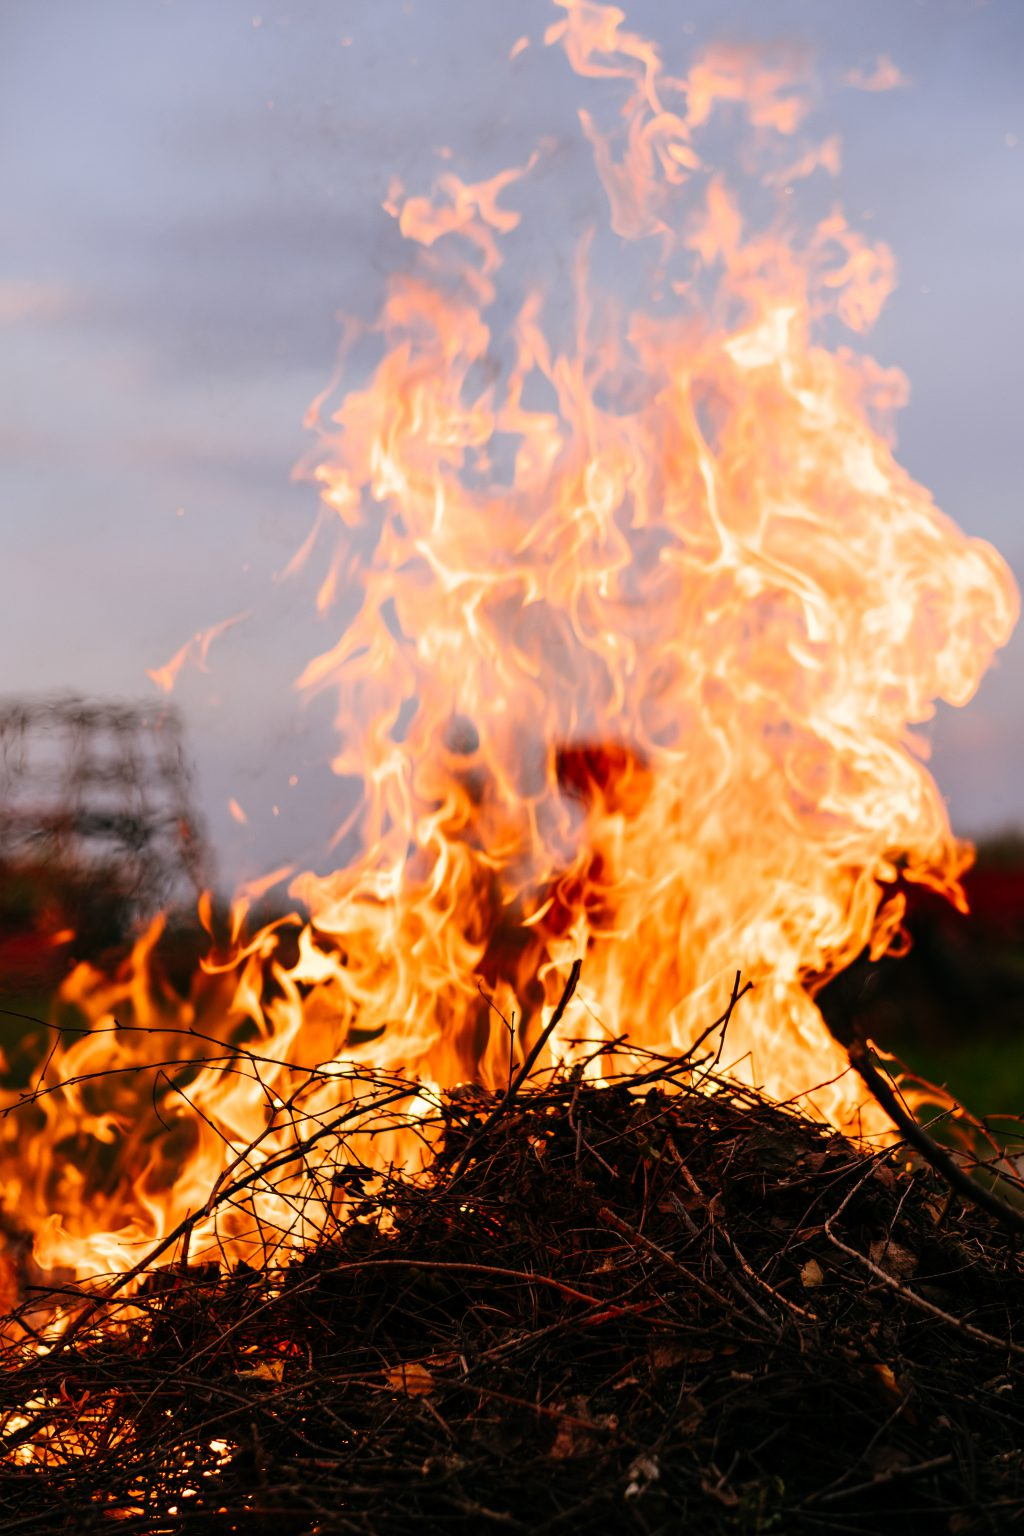 Bonfire flames 3 - free stock photo